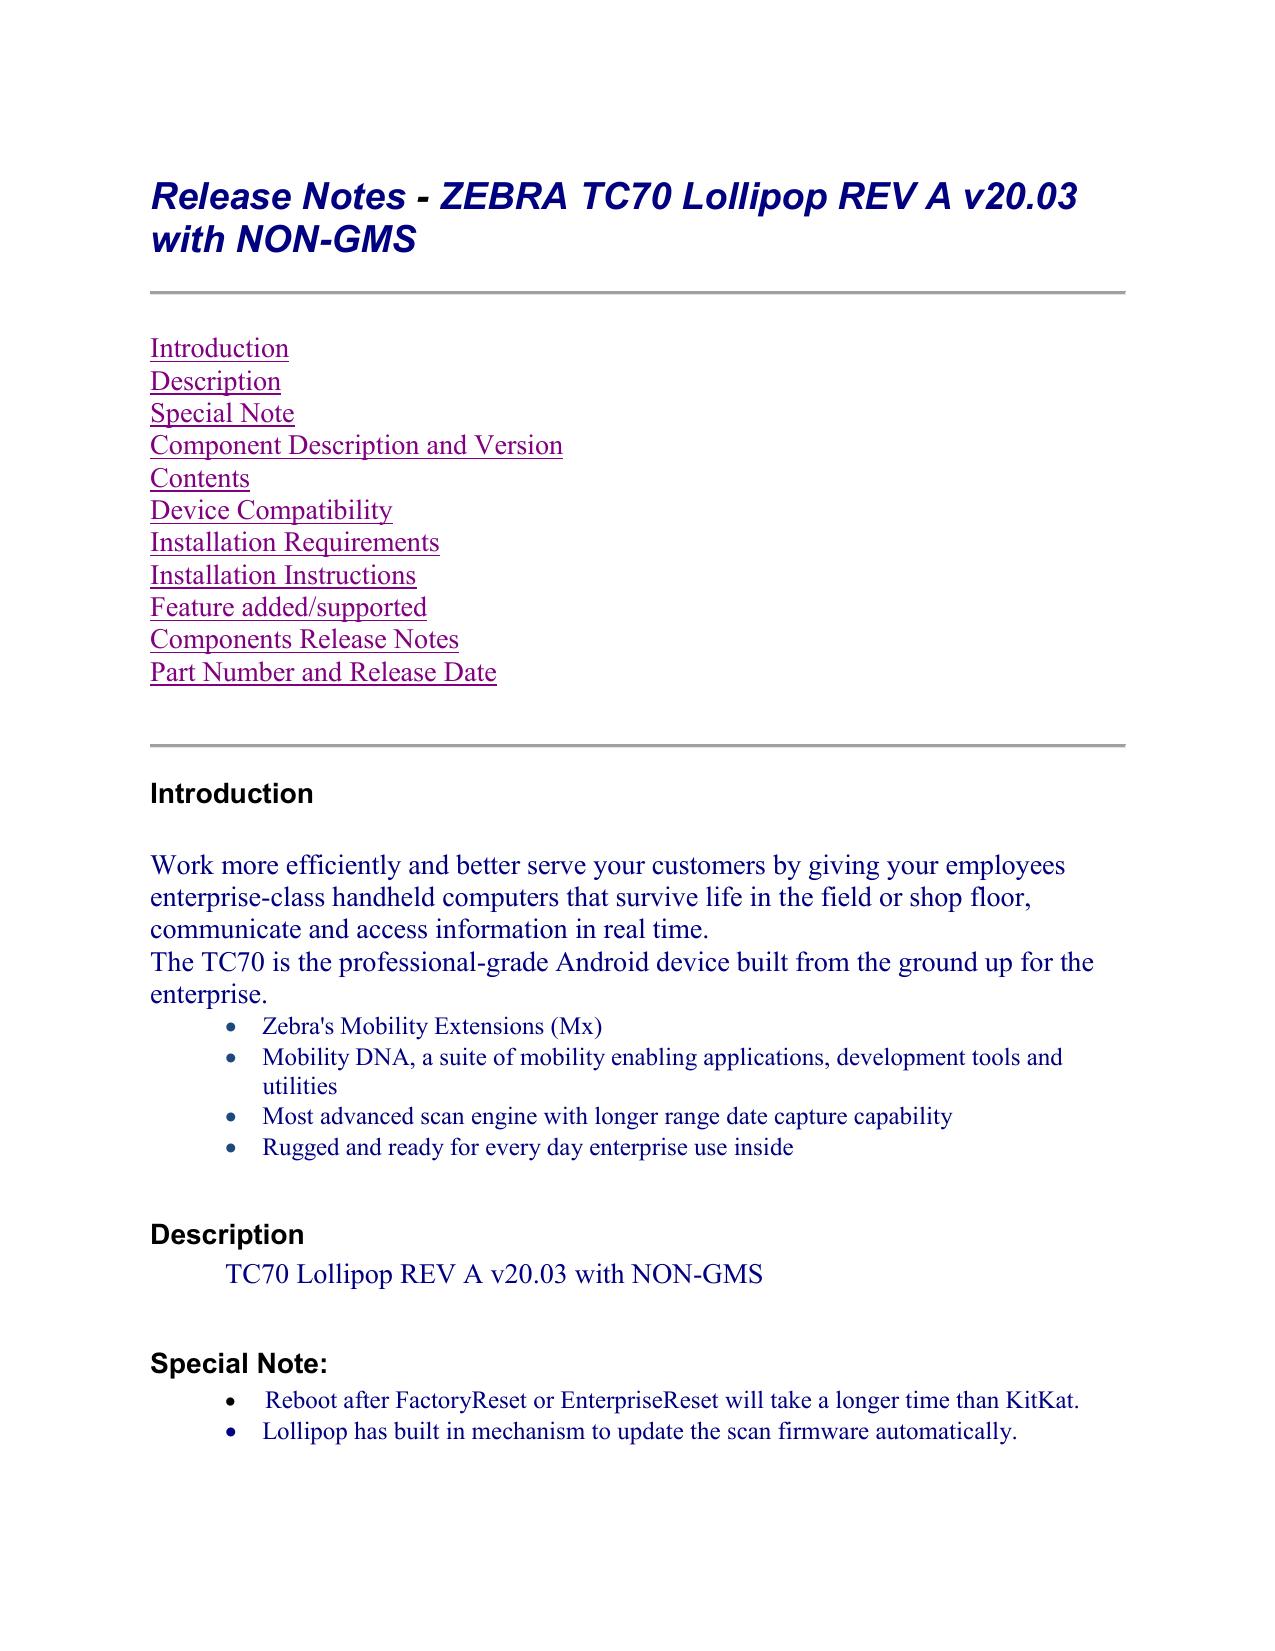 Release Notes - ZEBRA TC70 Lollipop REV A v20 03 with NON